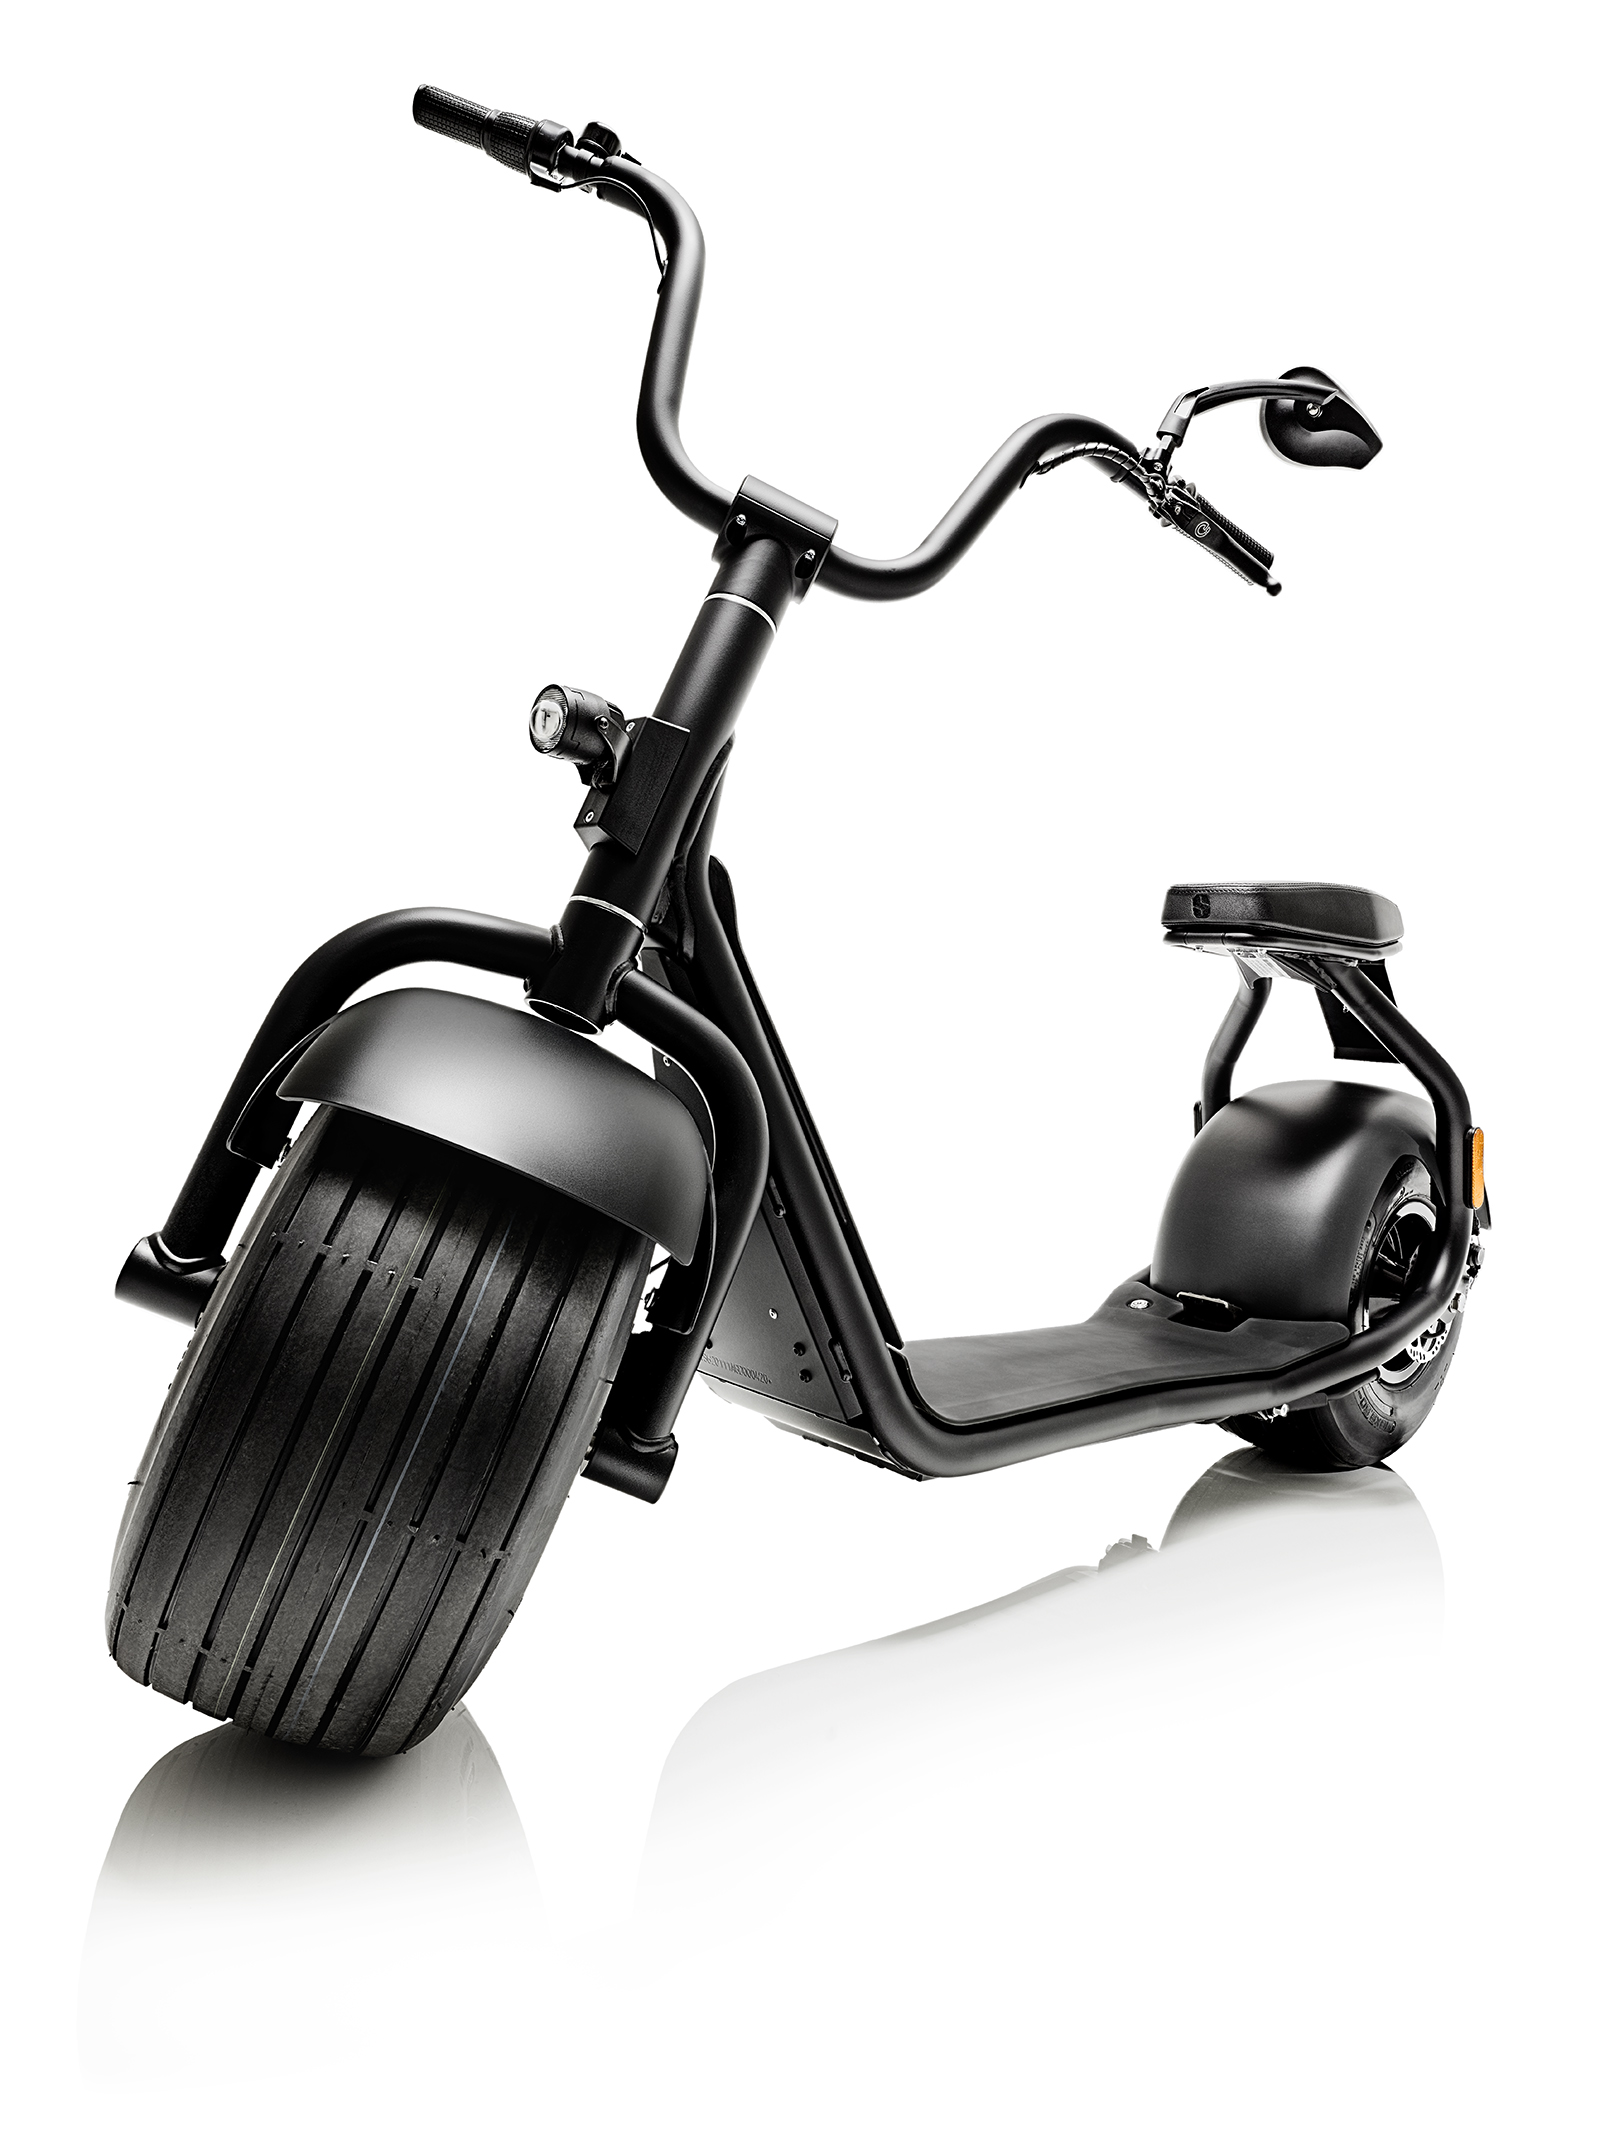 SCROOSER 1.1 E-Scooter mit Strassenzulassung, (20Ah, 500Watt)